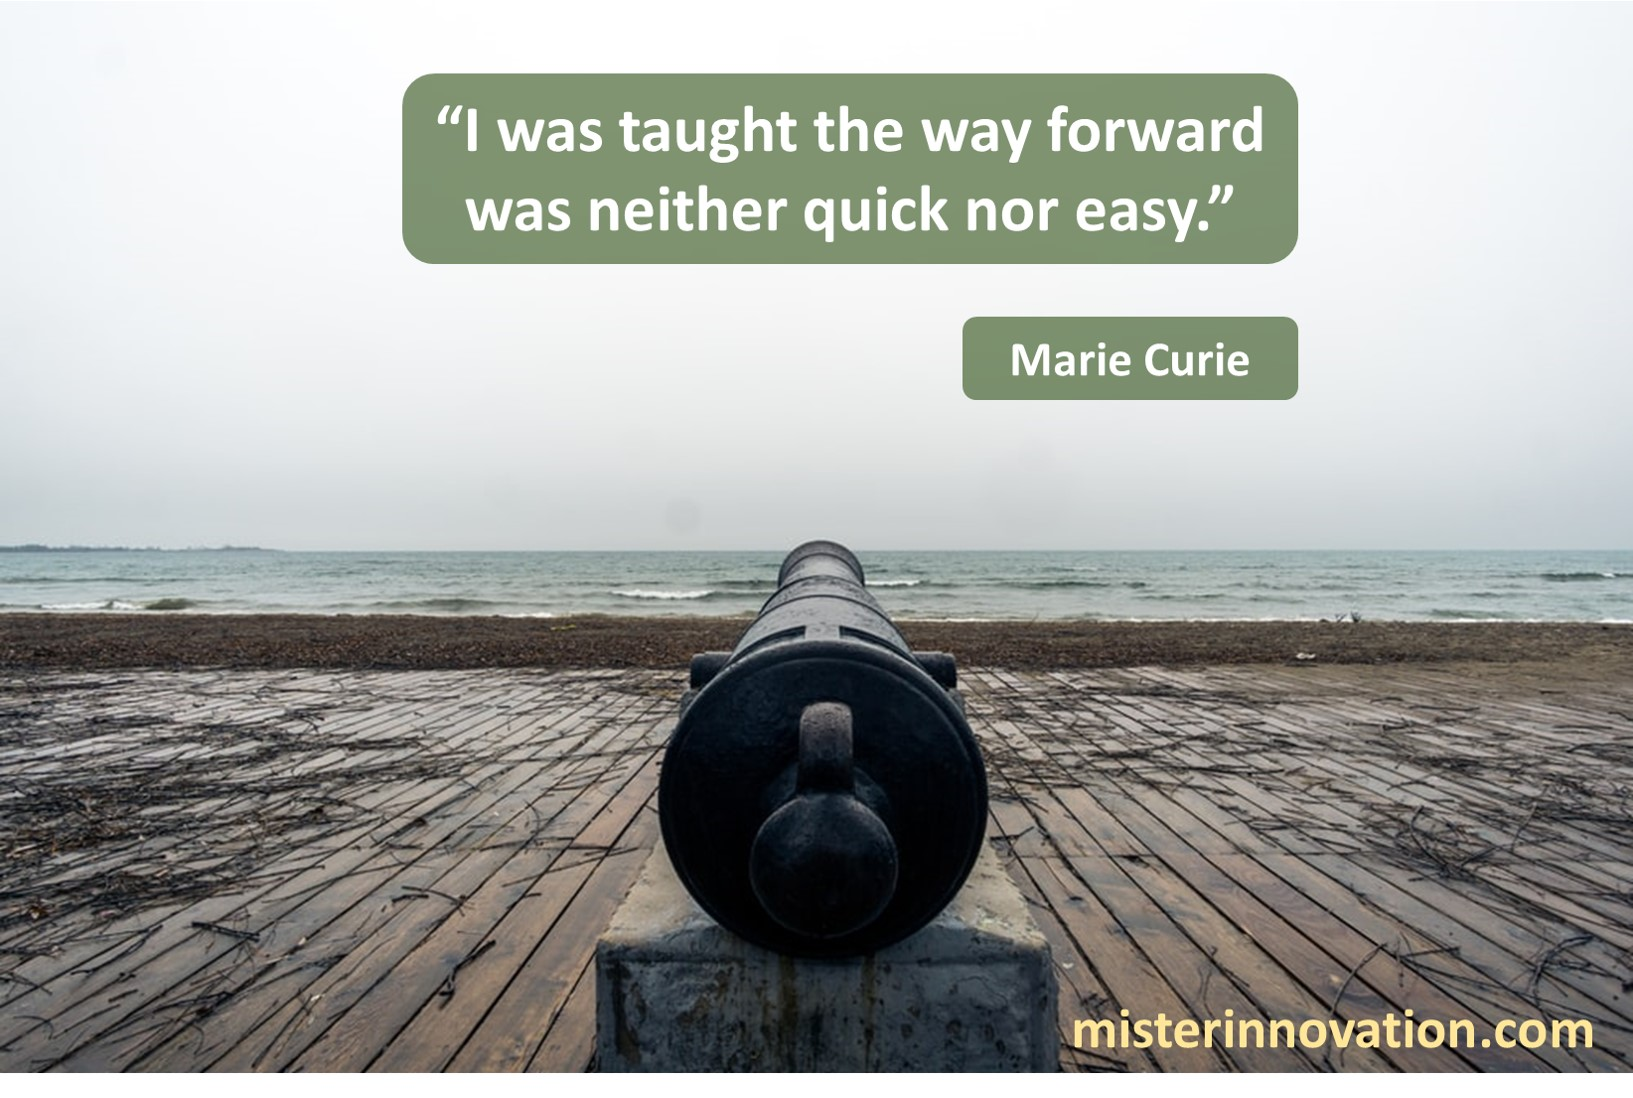 Marie Curie Way Forward